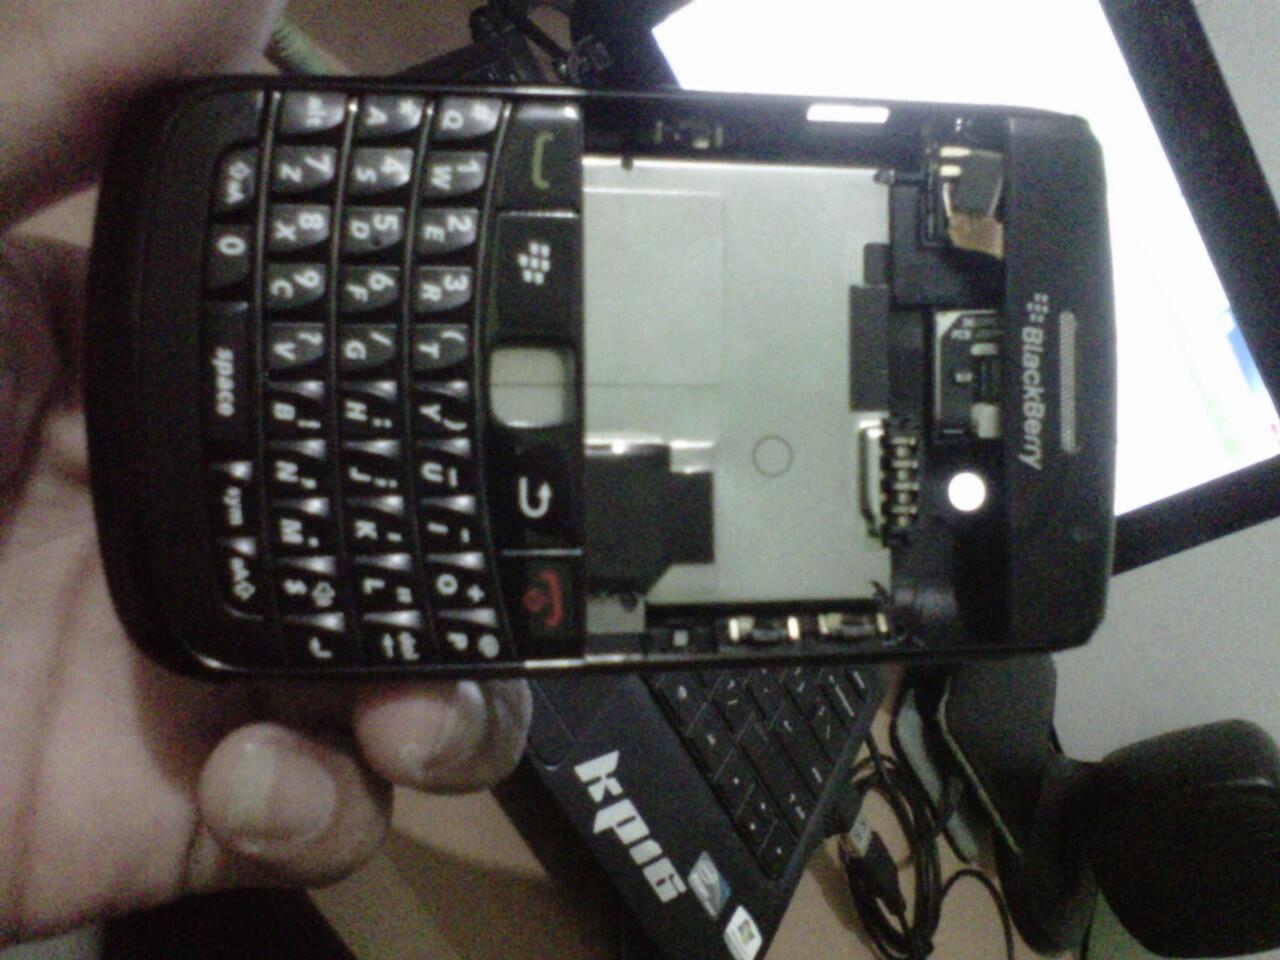 casing onyx 2 9780 hitam